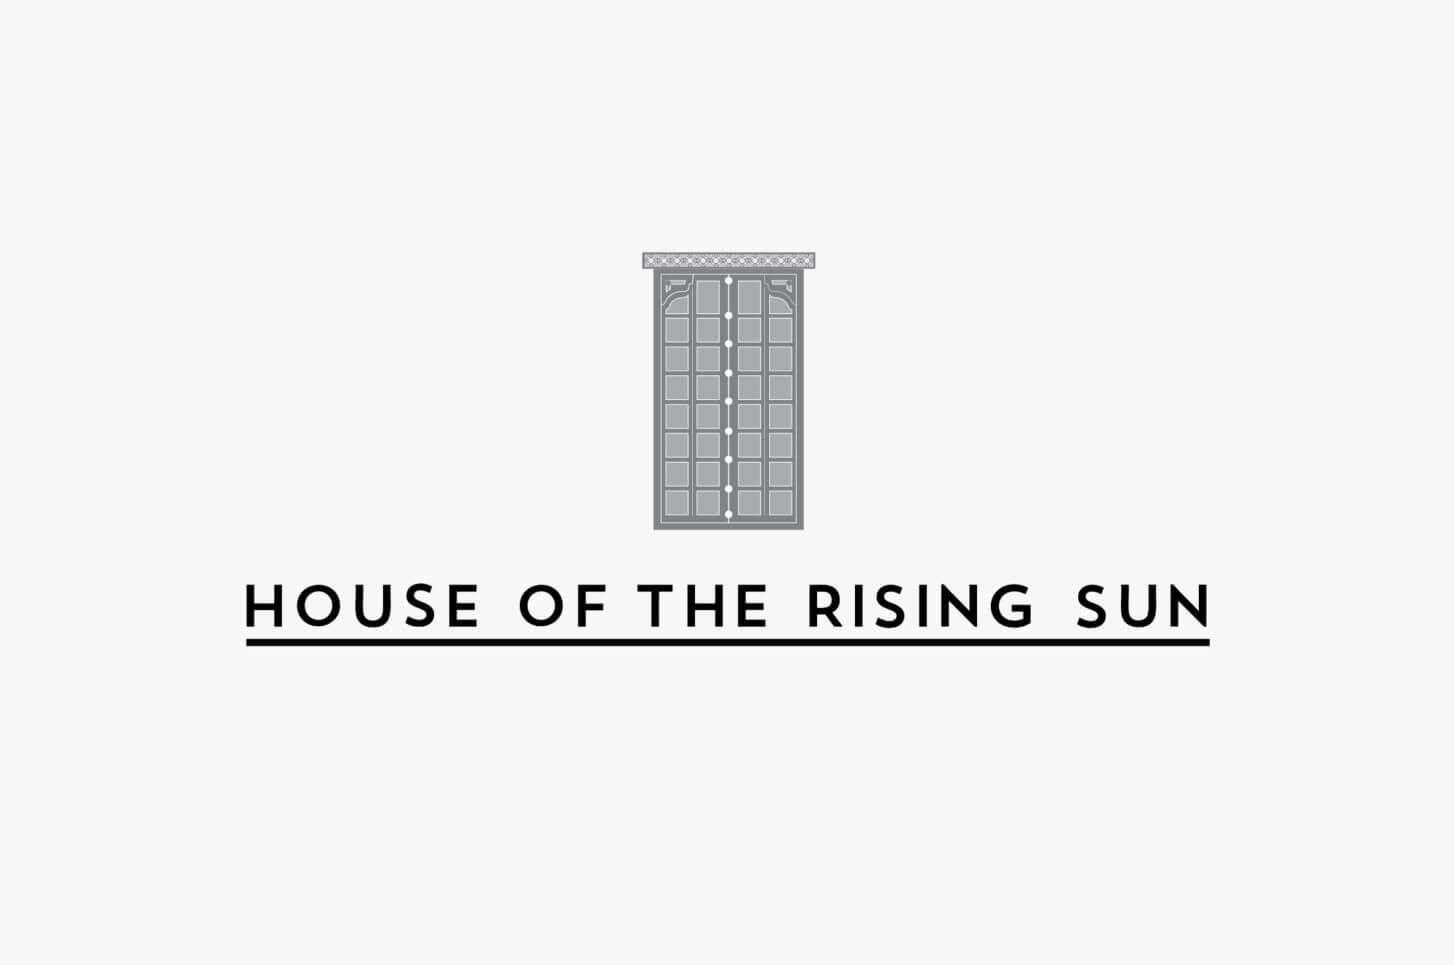 House Of The Rising Sun Restaurant